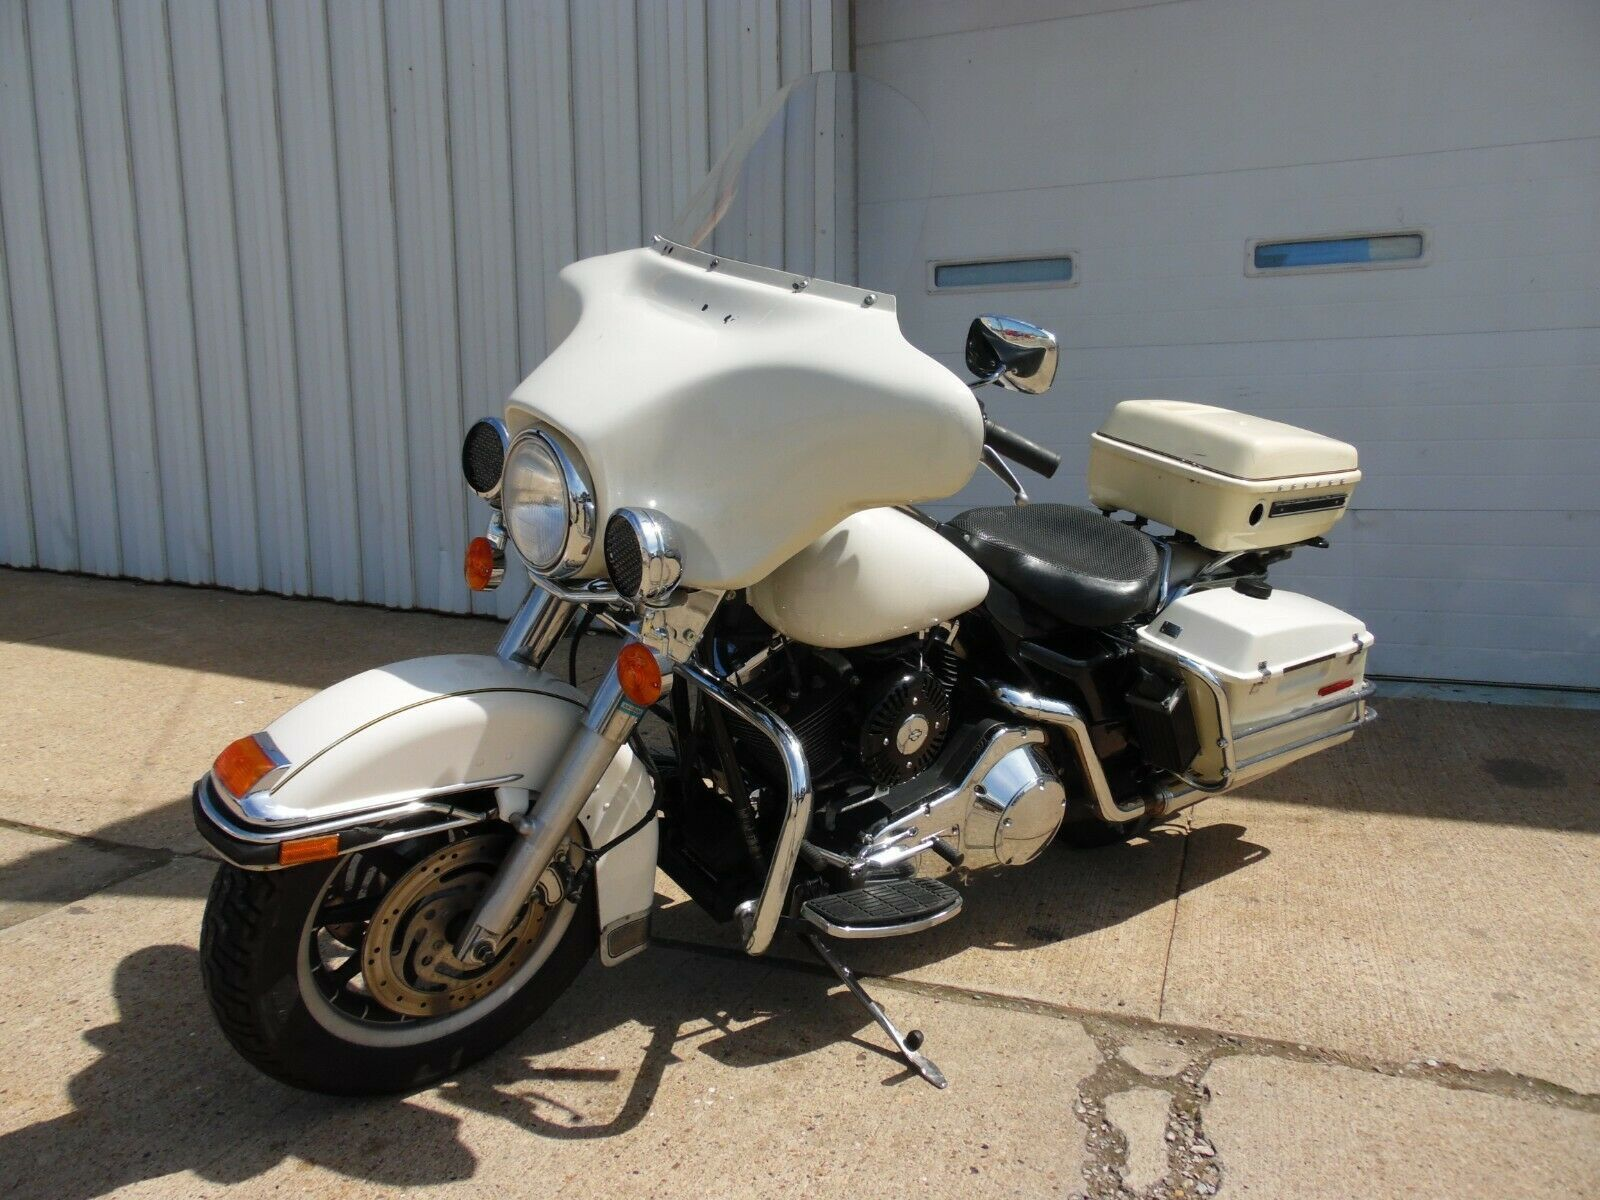 2001 Harley Davidson Touring 2001 Harley Davidson Flhtpi Police Interceptor Bike Electra Glide To Harley Davidson Touring Harley Davidson Bikes Harley Davidson [ 1200 x 1600 Pixel ]